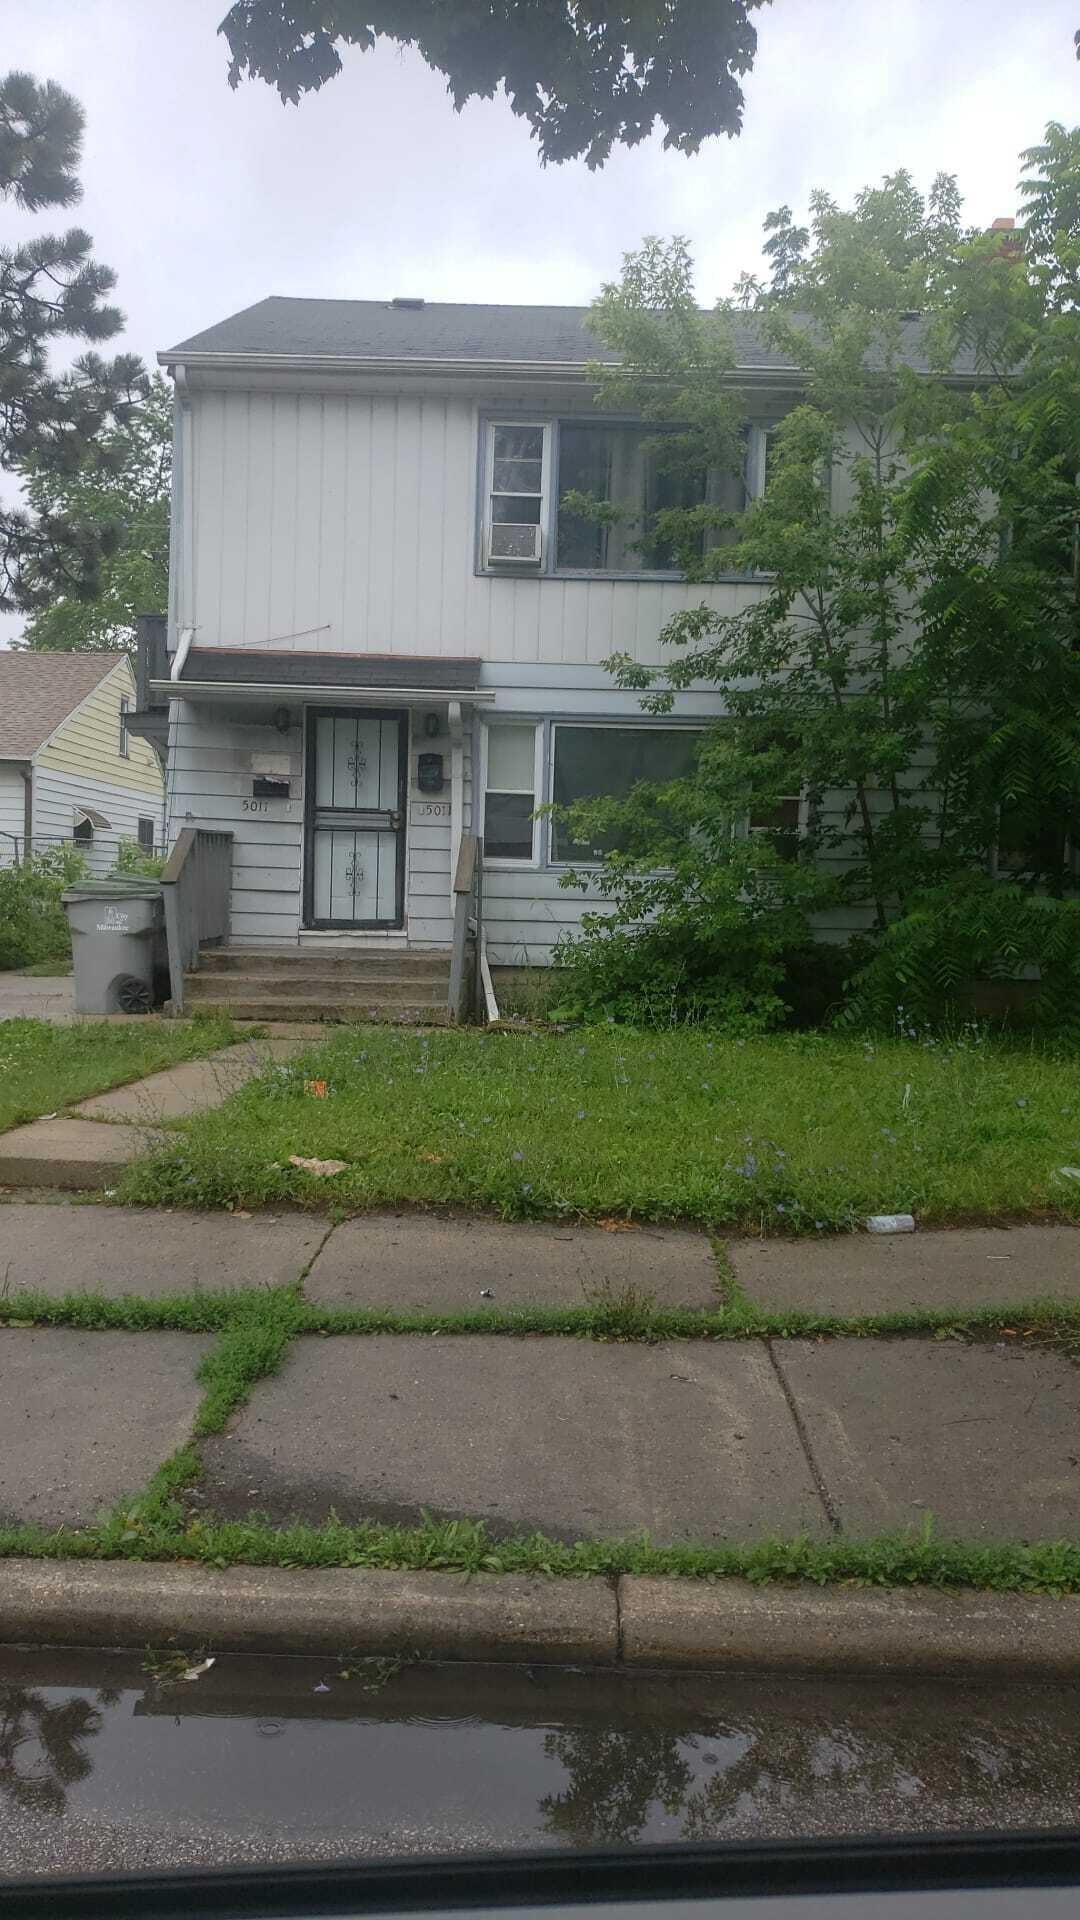 5011 N 60th St #5013, Milwaukee, WI 53218 - #: 1749119